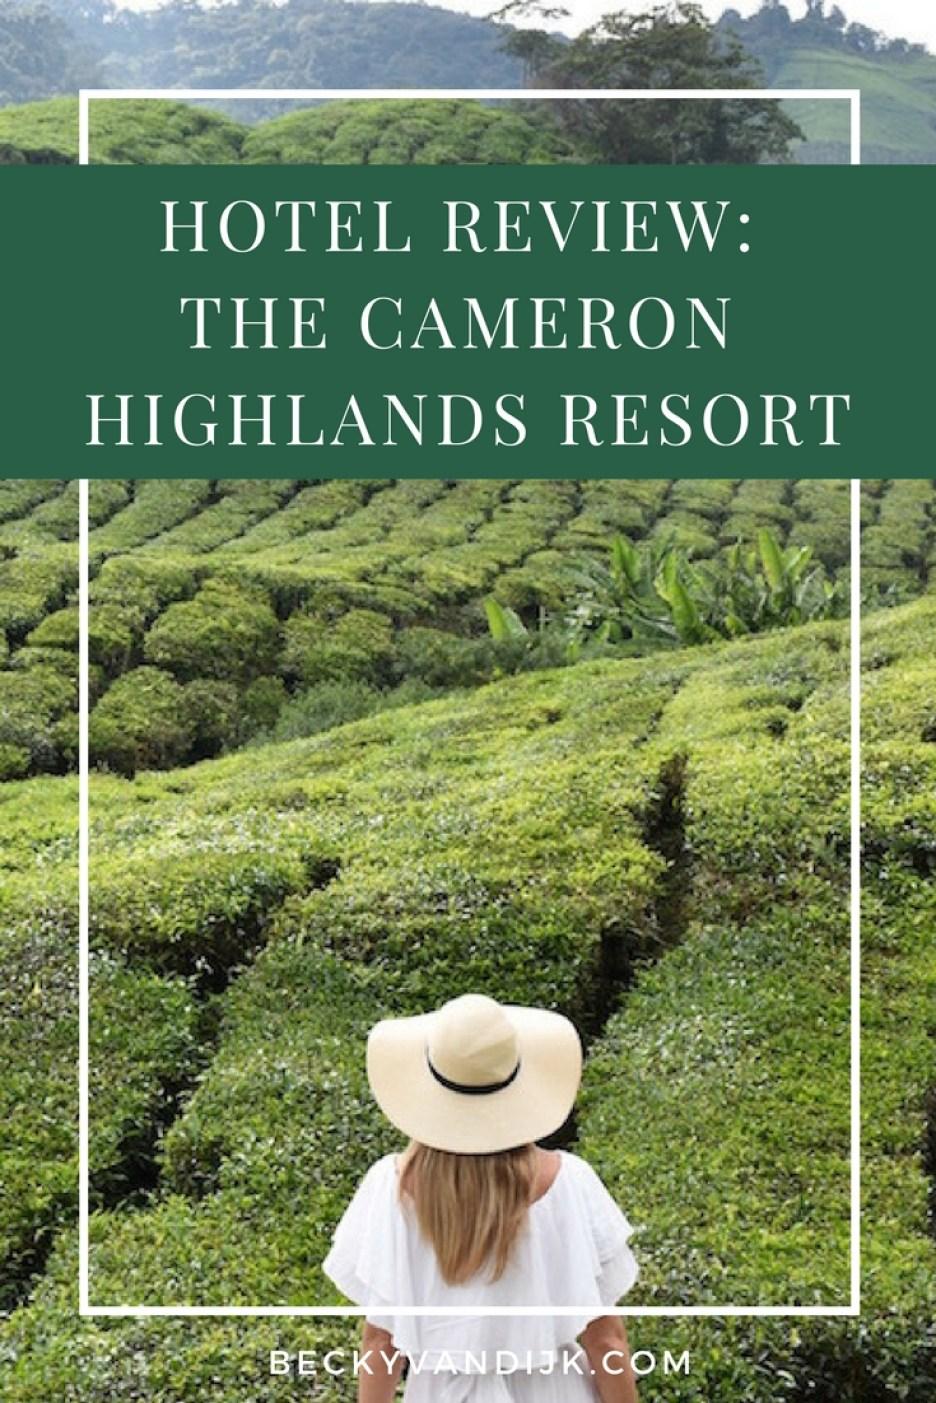 HOTEL-REVIEW_-THE-CAMERON-HIGHLANDS-RESOR